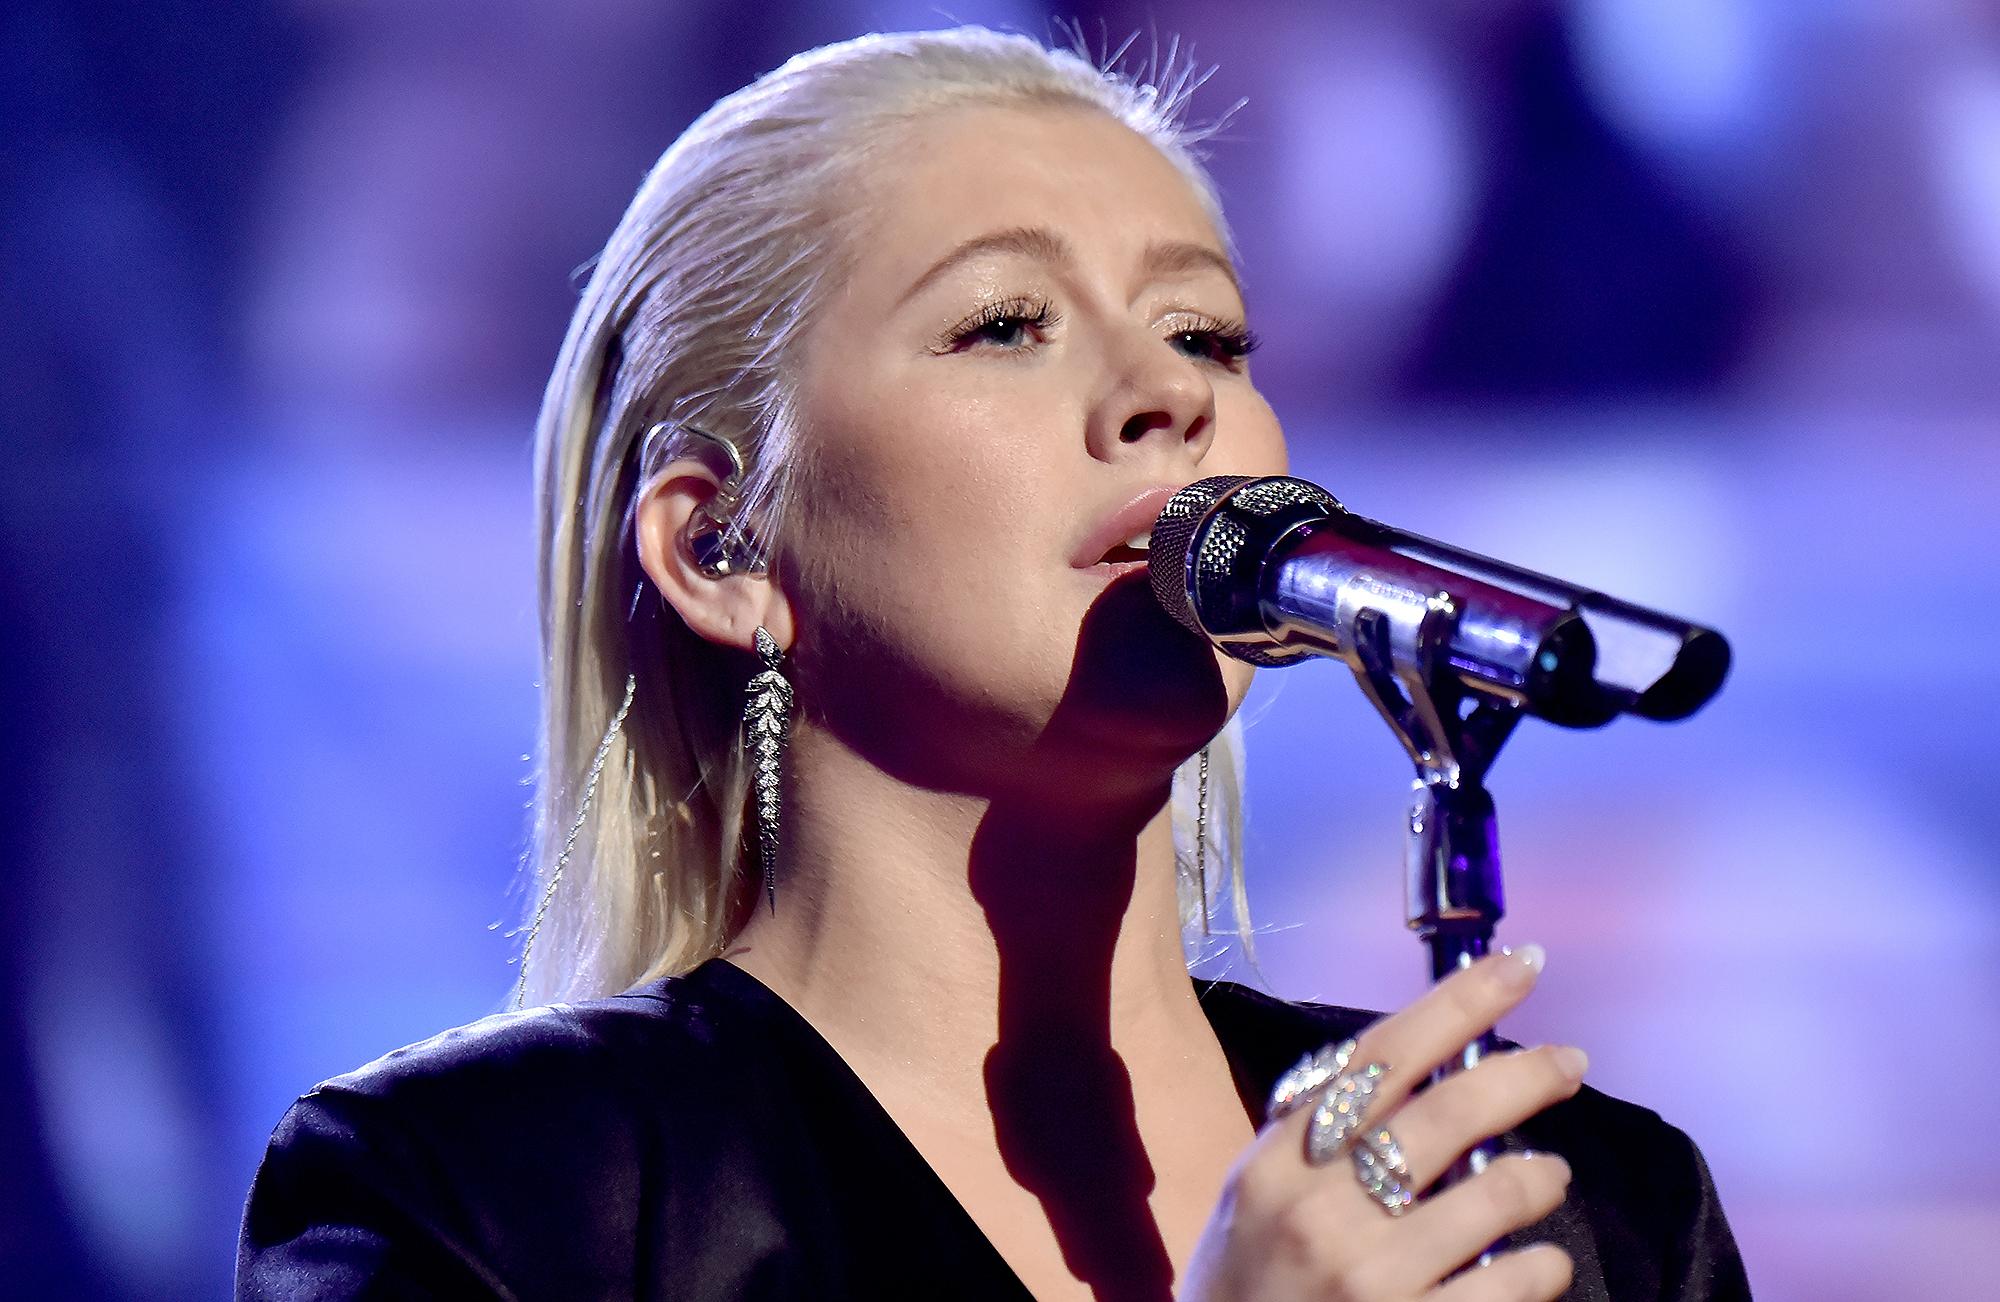 Christina Aguilera's Whitney Houston Tribute Has the Internet Divided